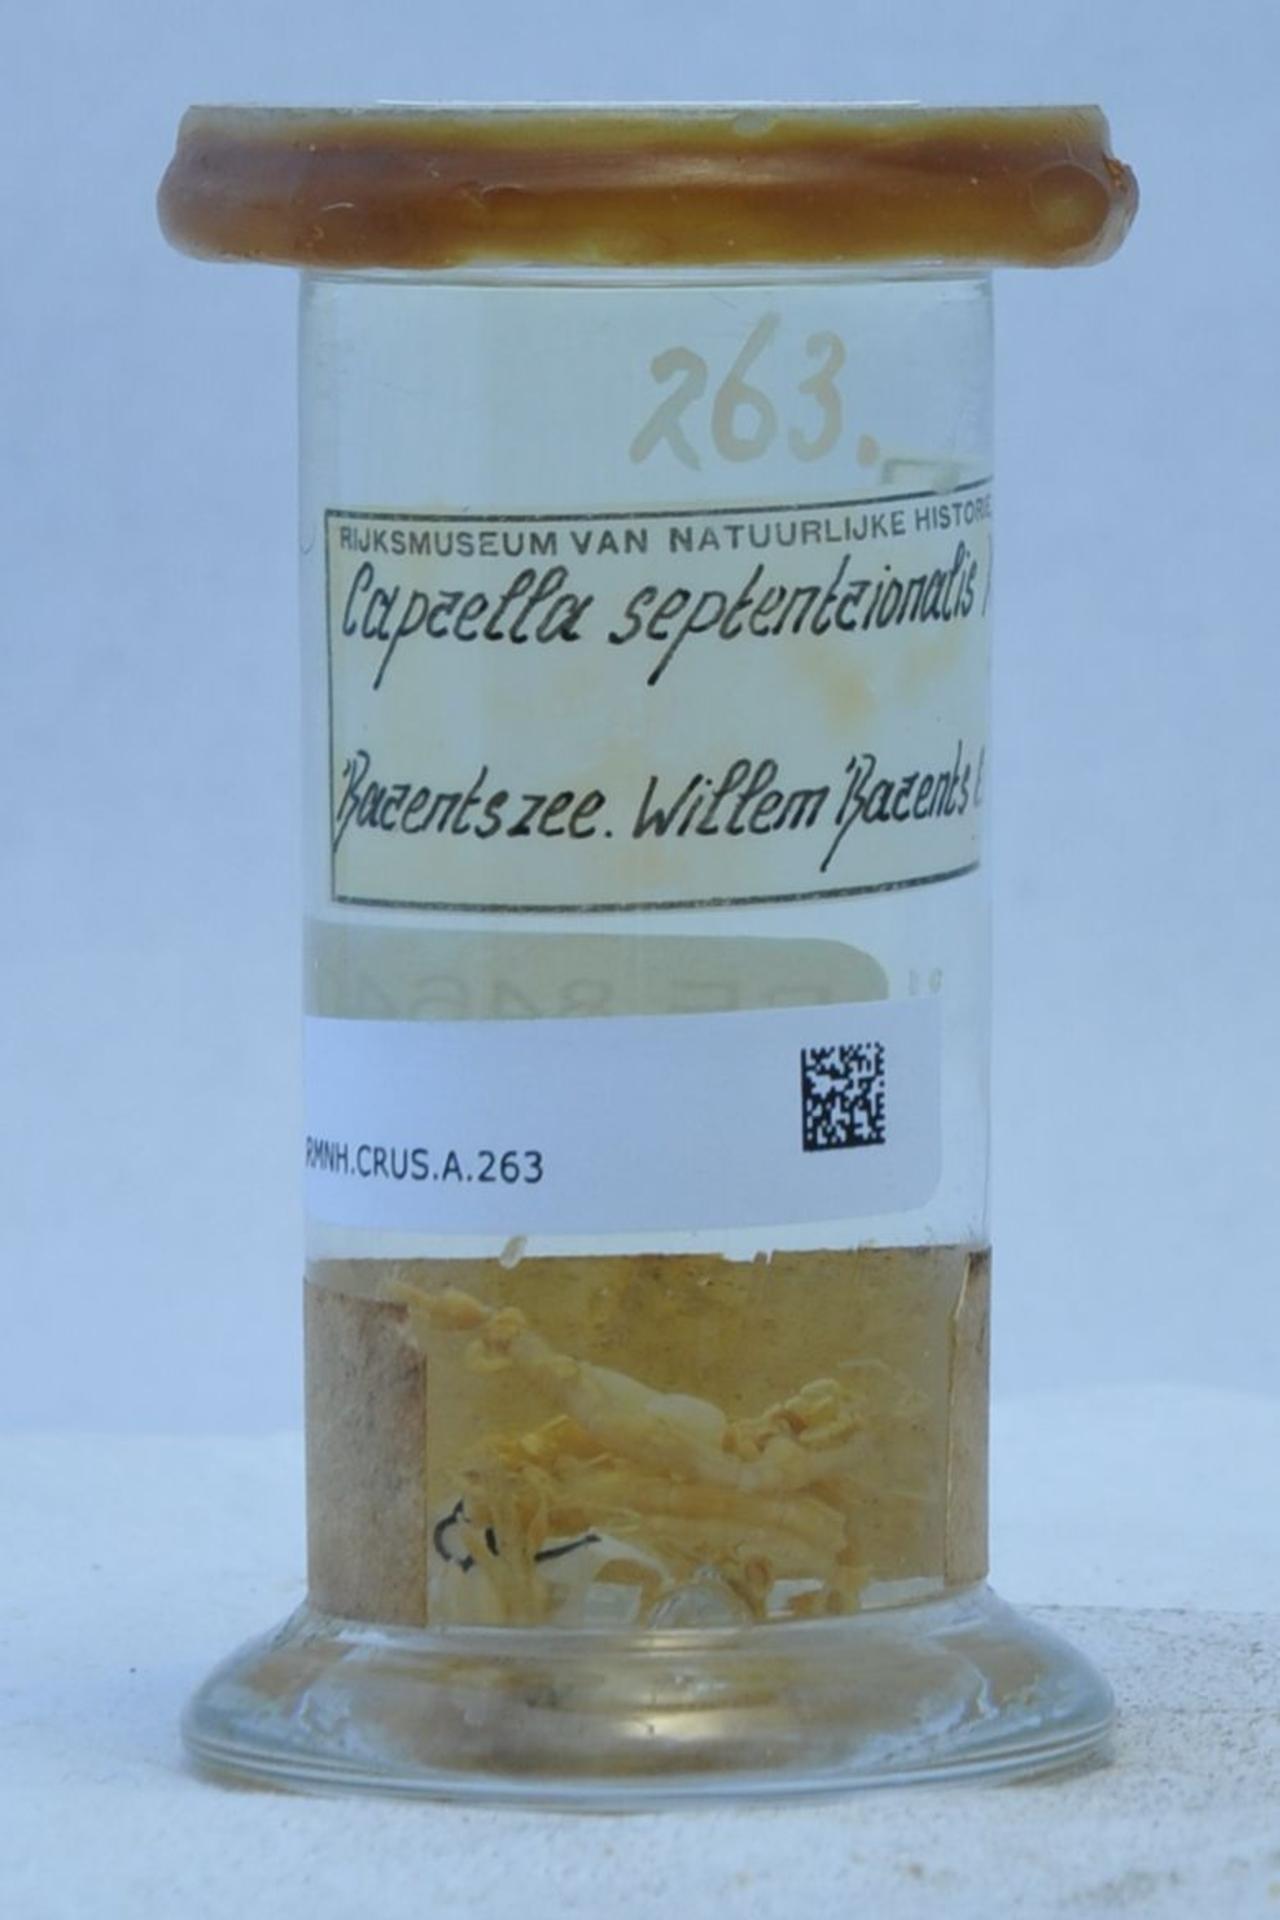 RMNH.CRUS.A.263 | Caprella septentrionalis Kröyer